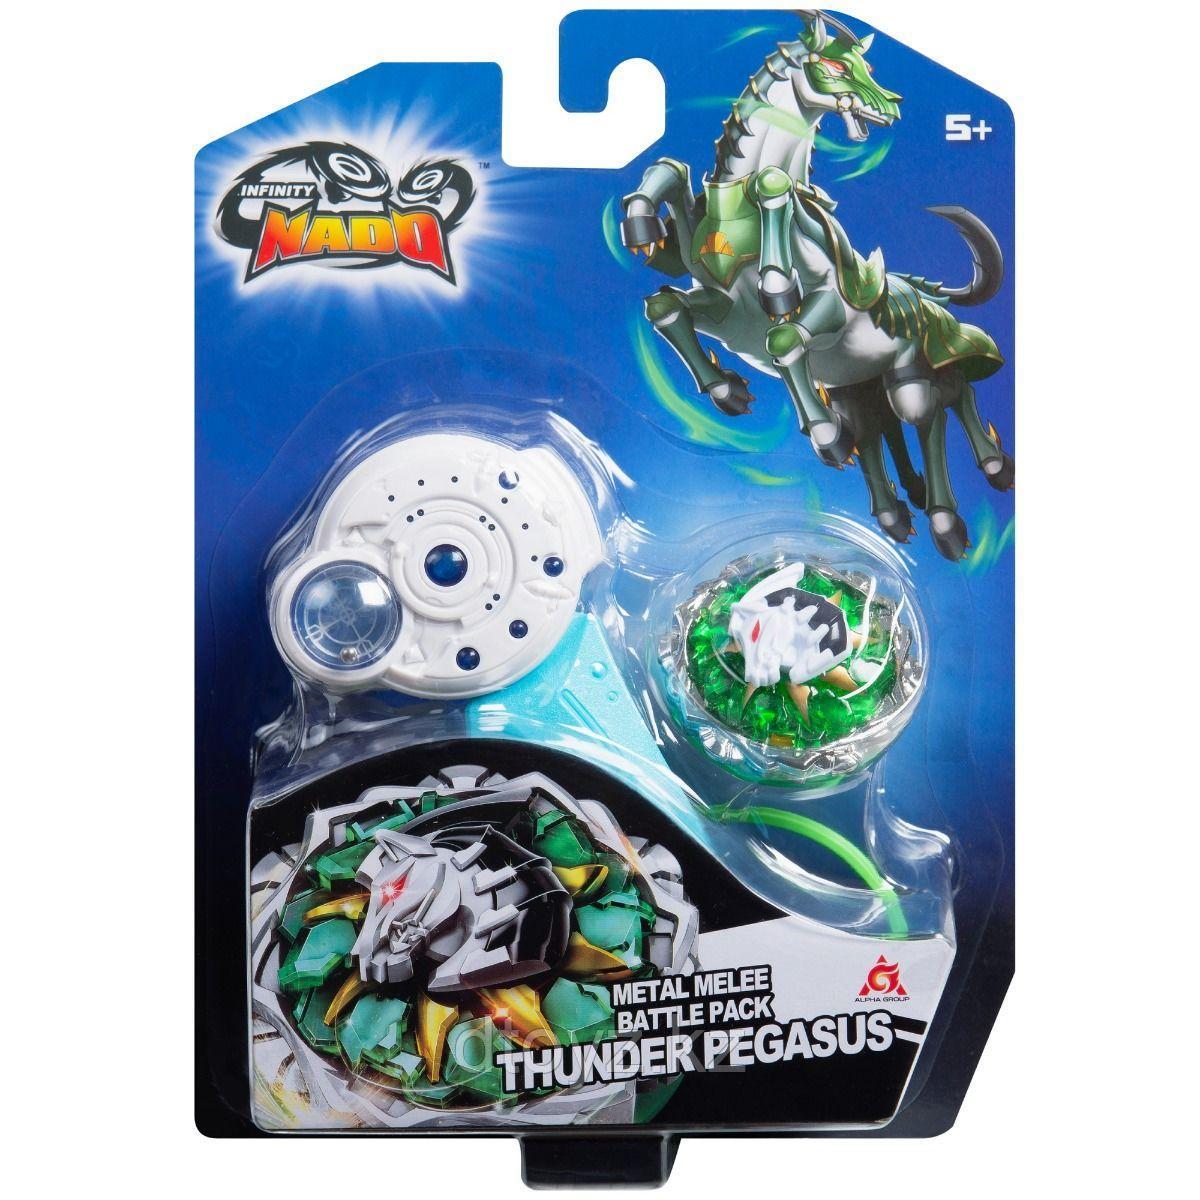 Infinity Nado: Волчок Классик, Thunder Pegasus